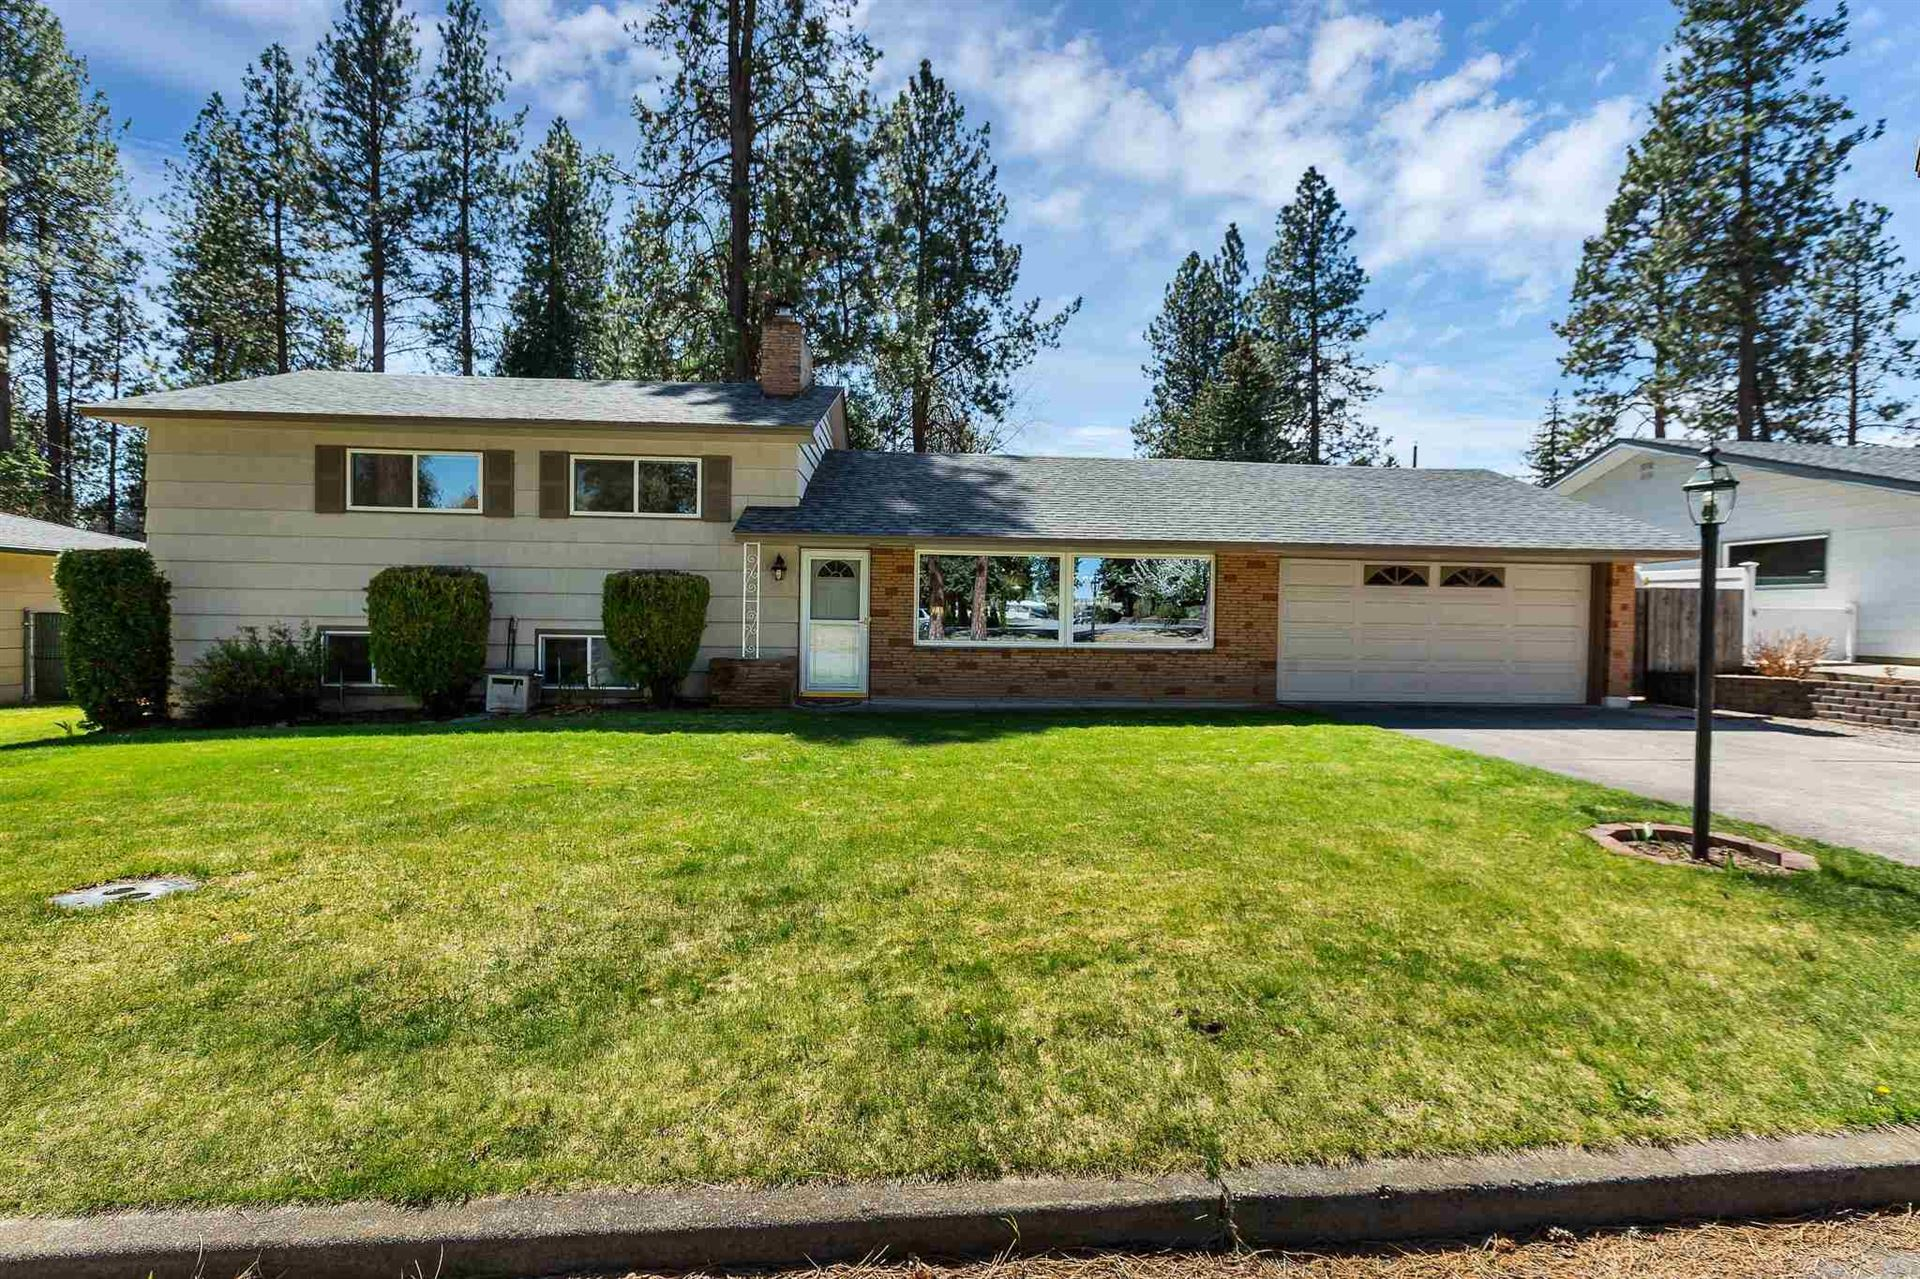 12924 E Saltese Ave, Spokane Valley, WA 99216-0362 - #: 202115047